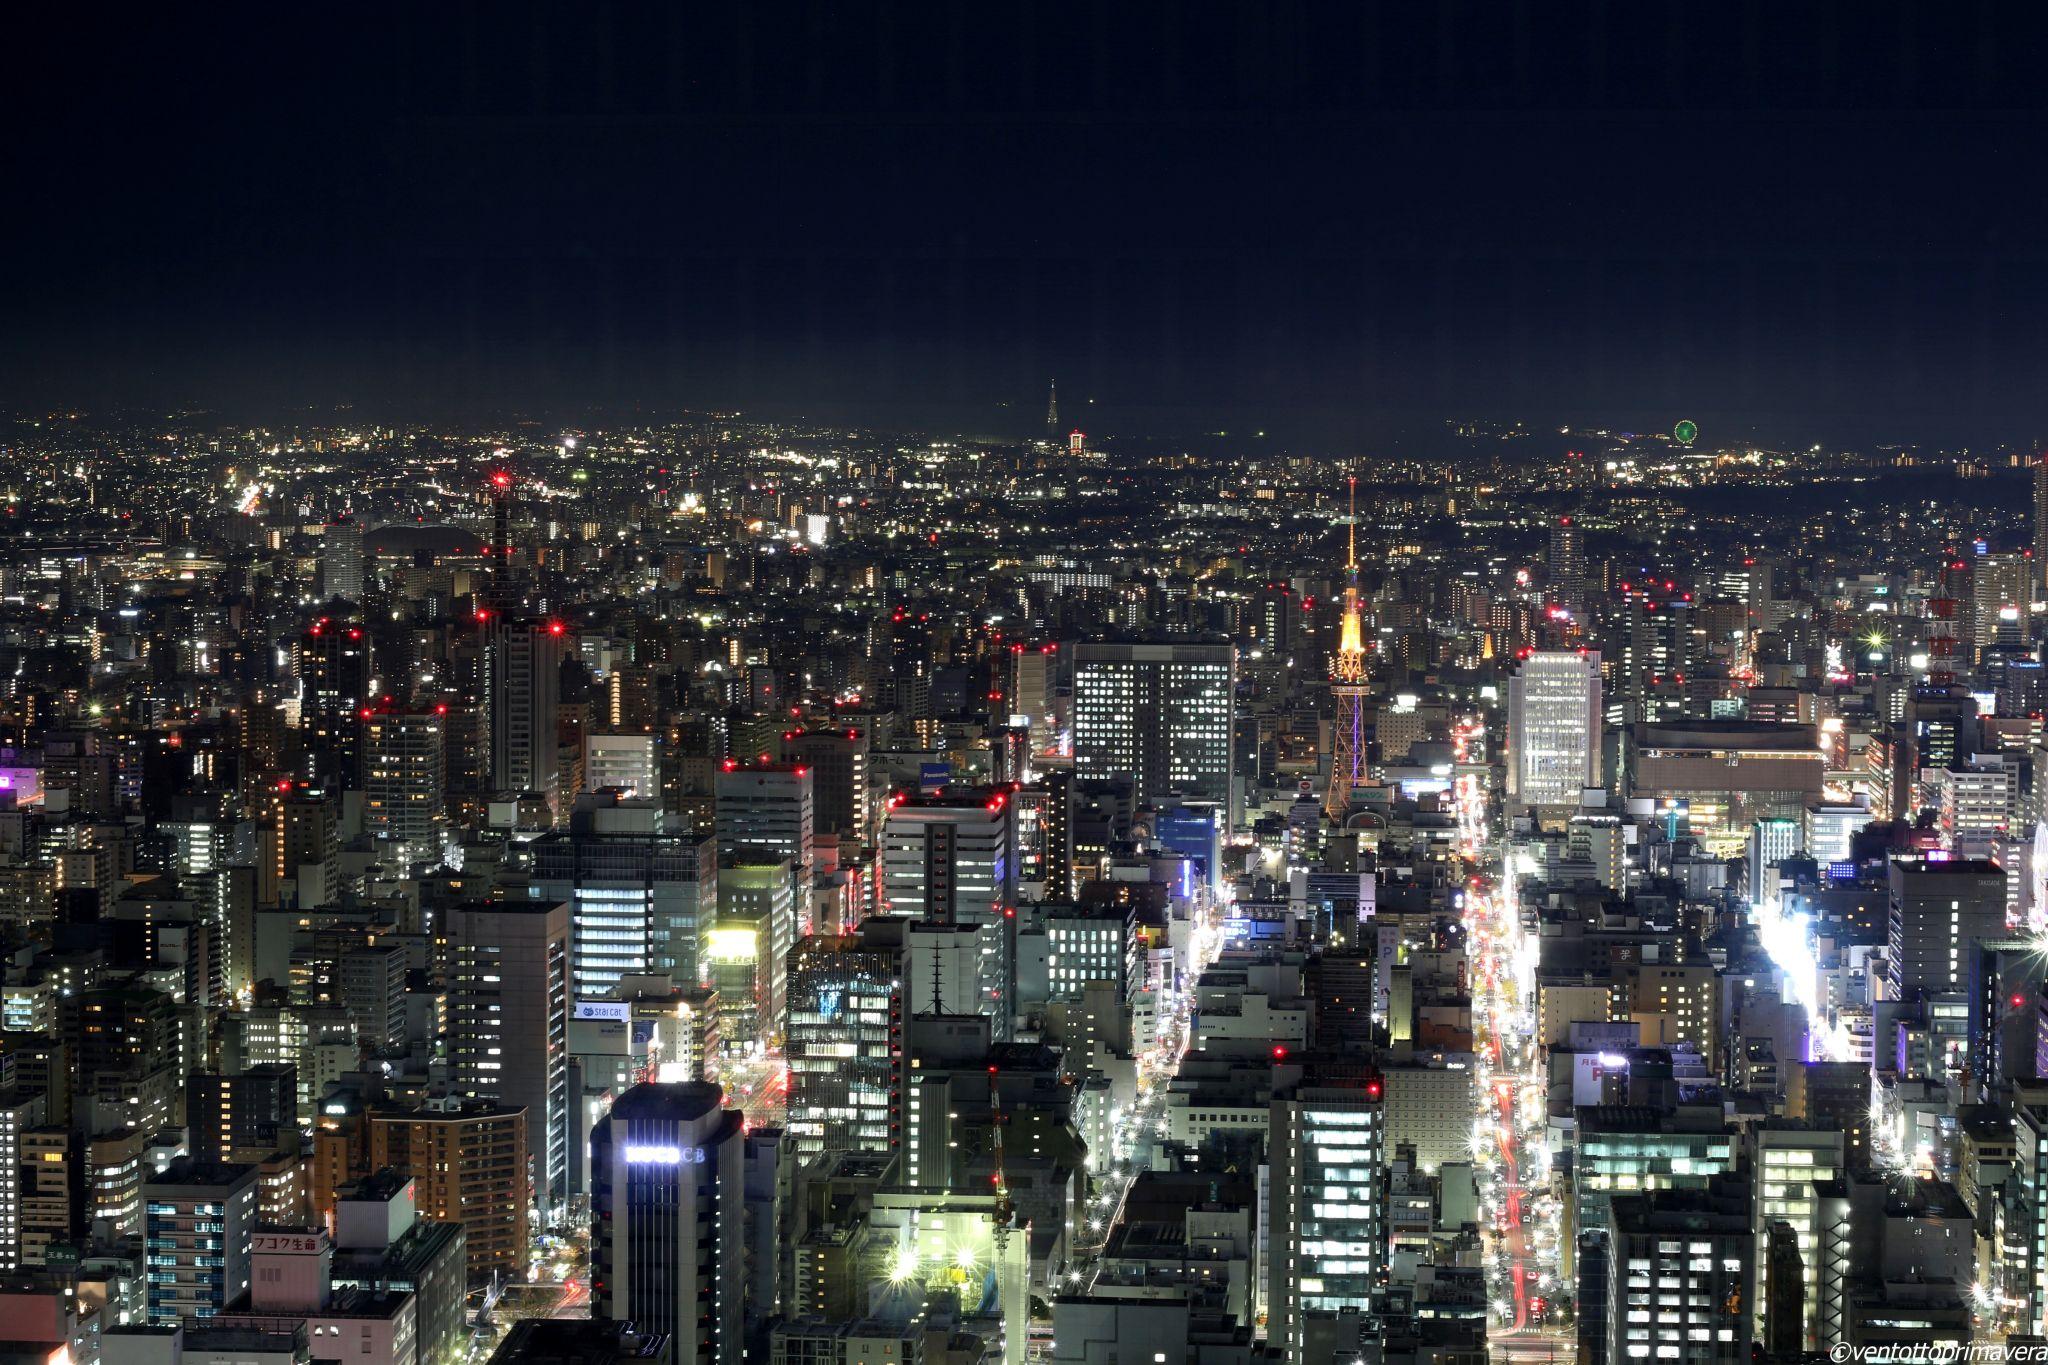 Nagoya Midland Square Sky Promenade, Japan